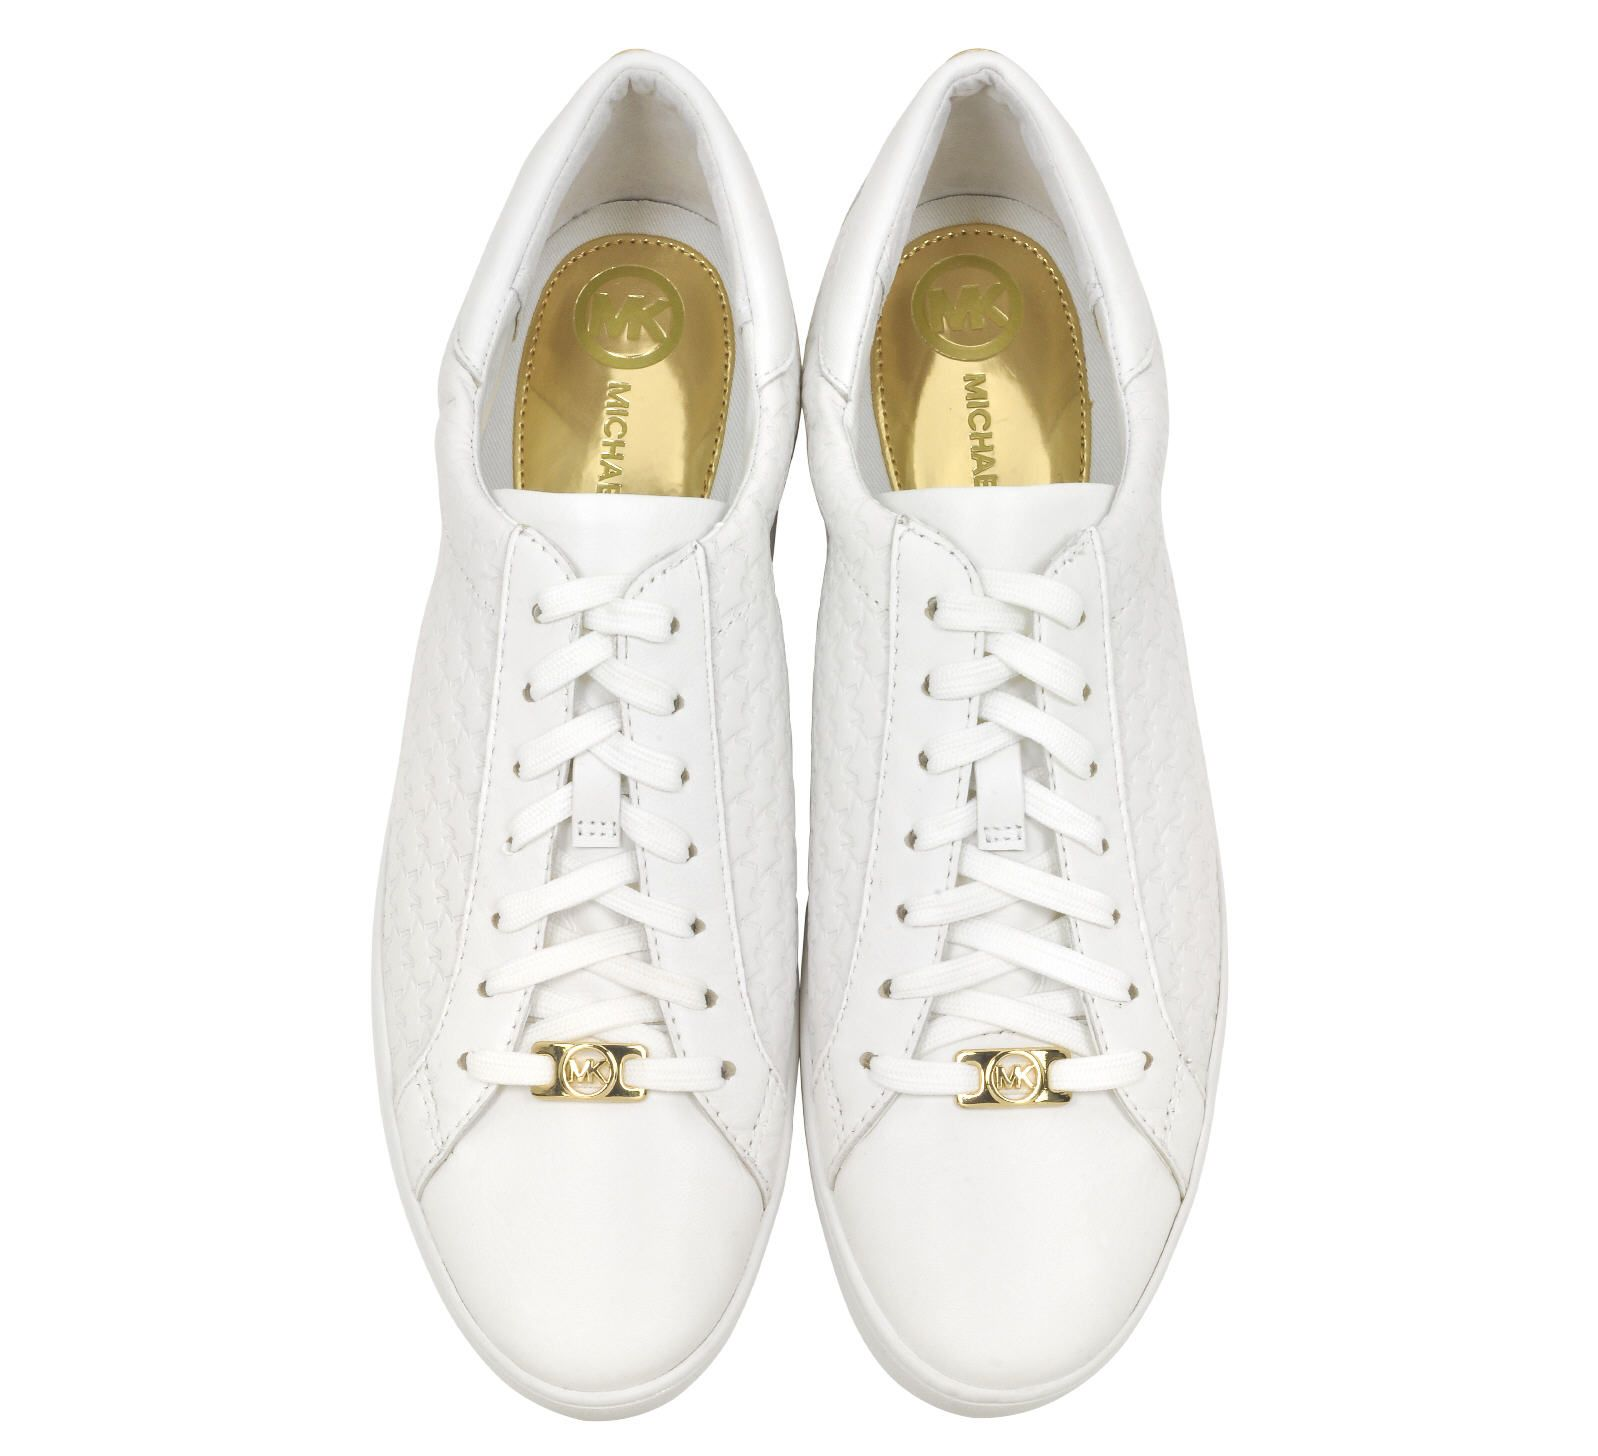 51f2adfcf63 Baskets en cuir blanc Colby Michael Kors avec logo en relief prix promo Baskets  Femme 140